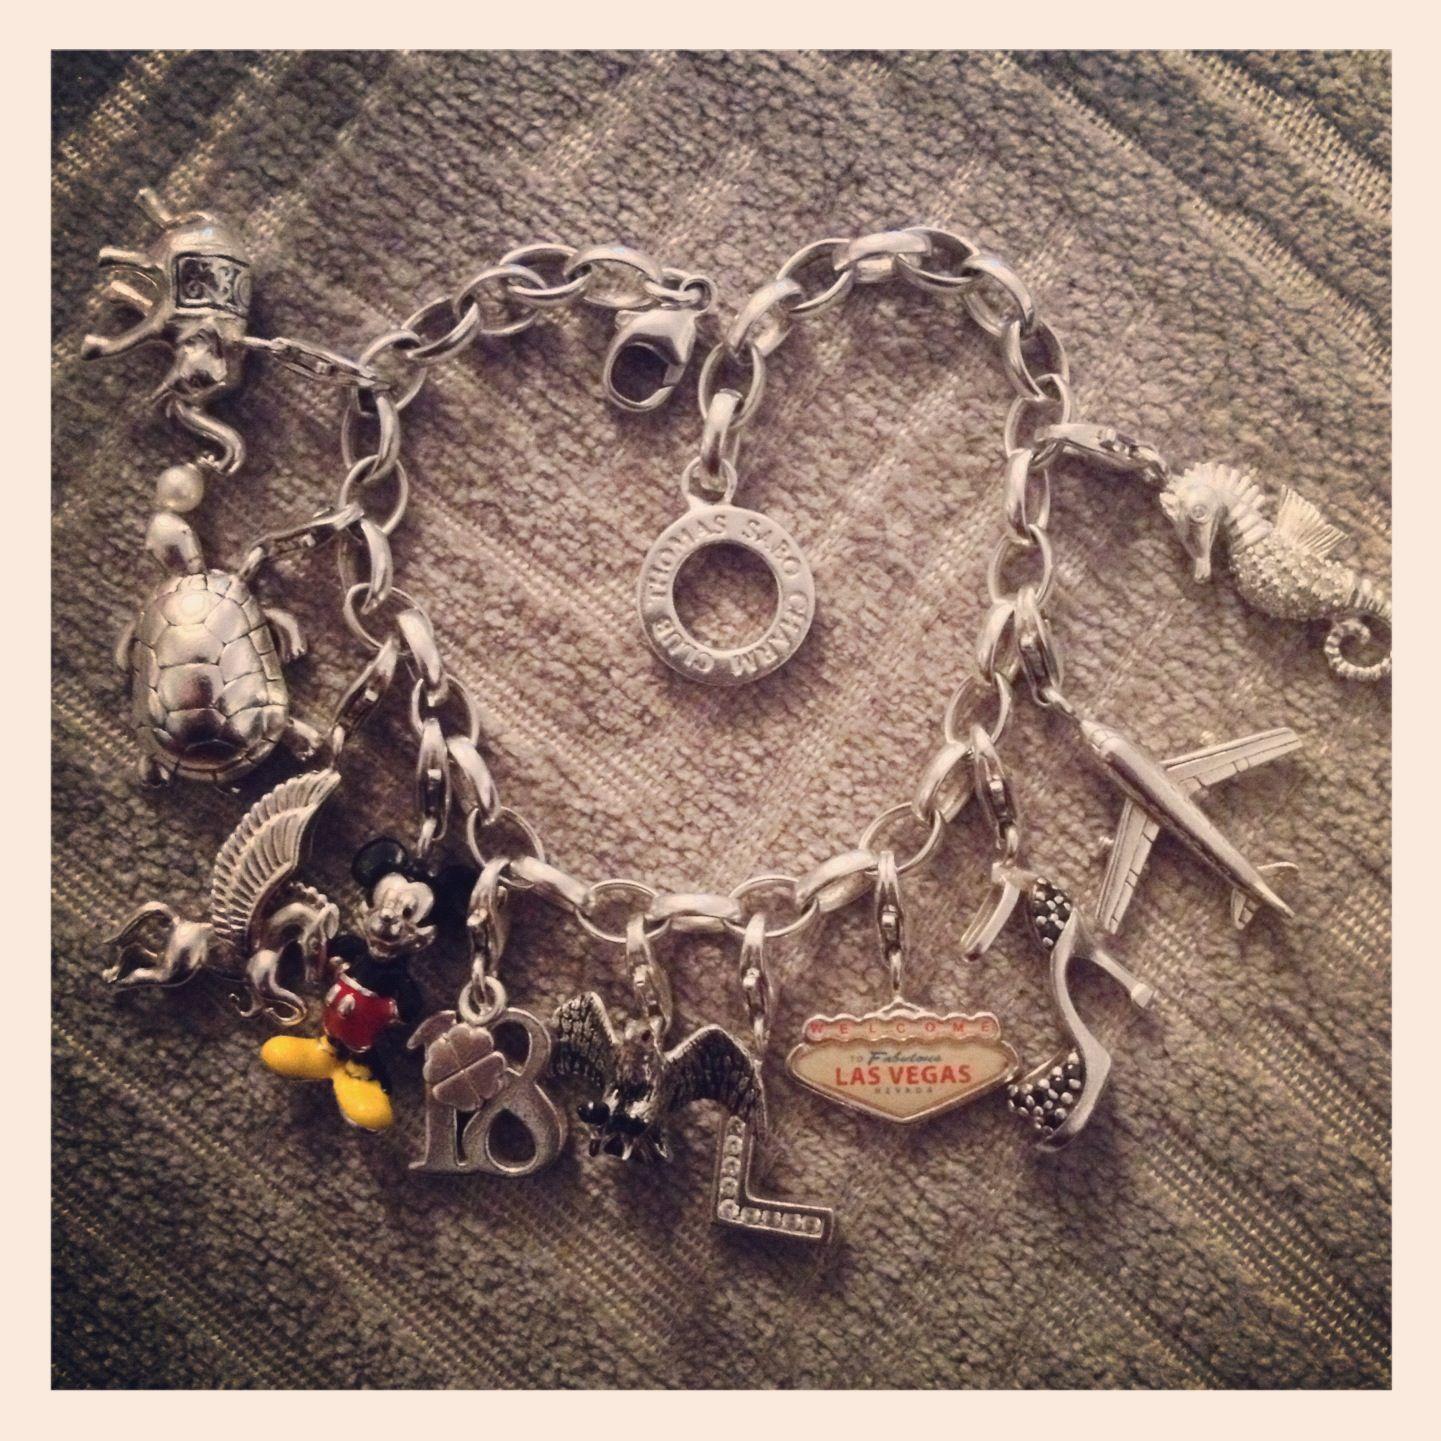 My Thomas Sabo Charm Club Bracelet Thomas Sabo Charms Thomas Sabo Charm Bracelet